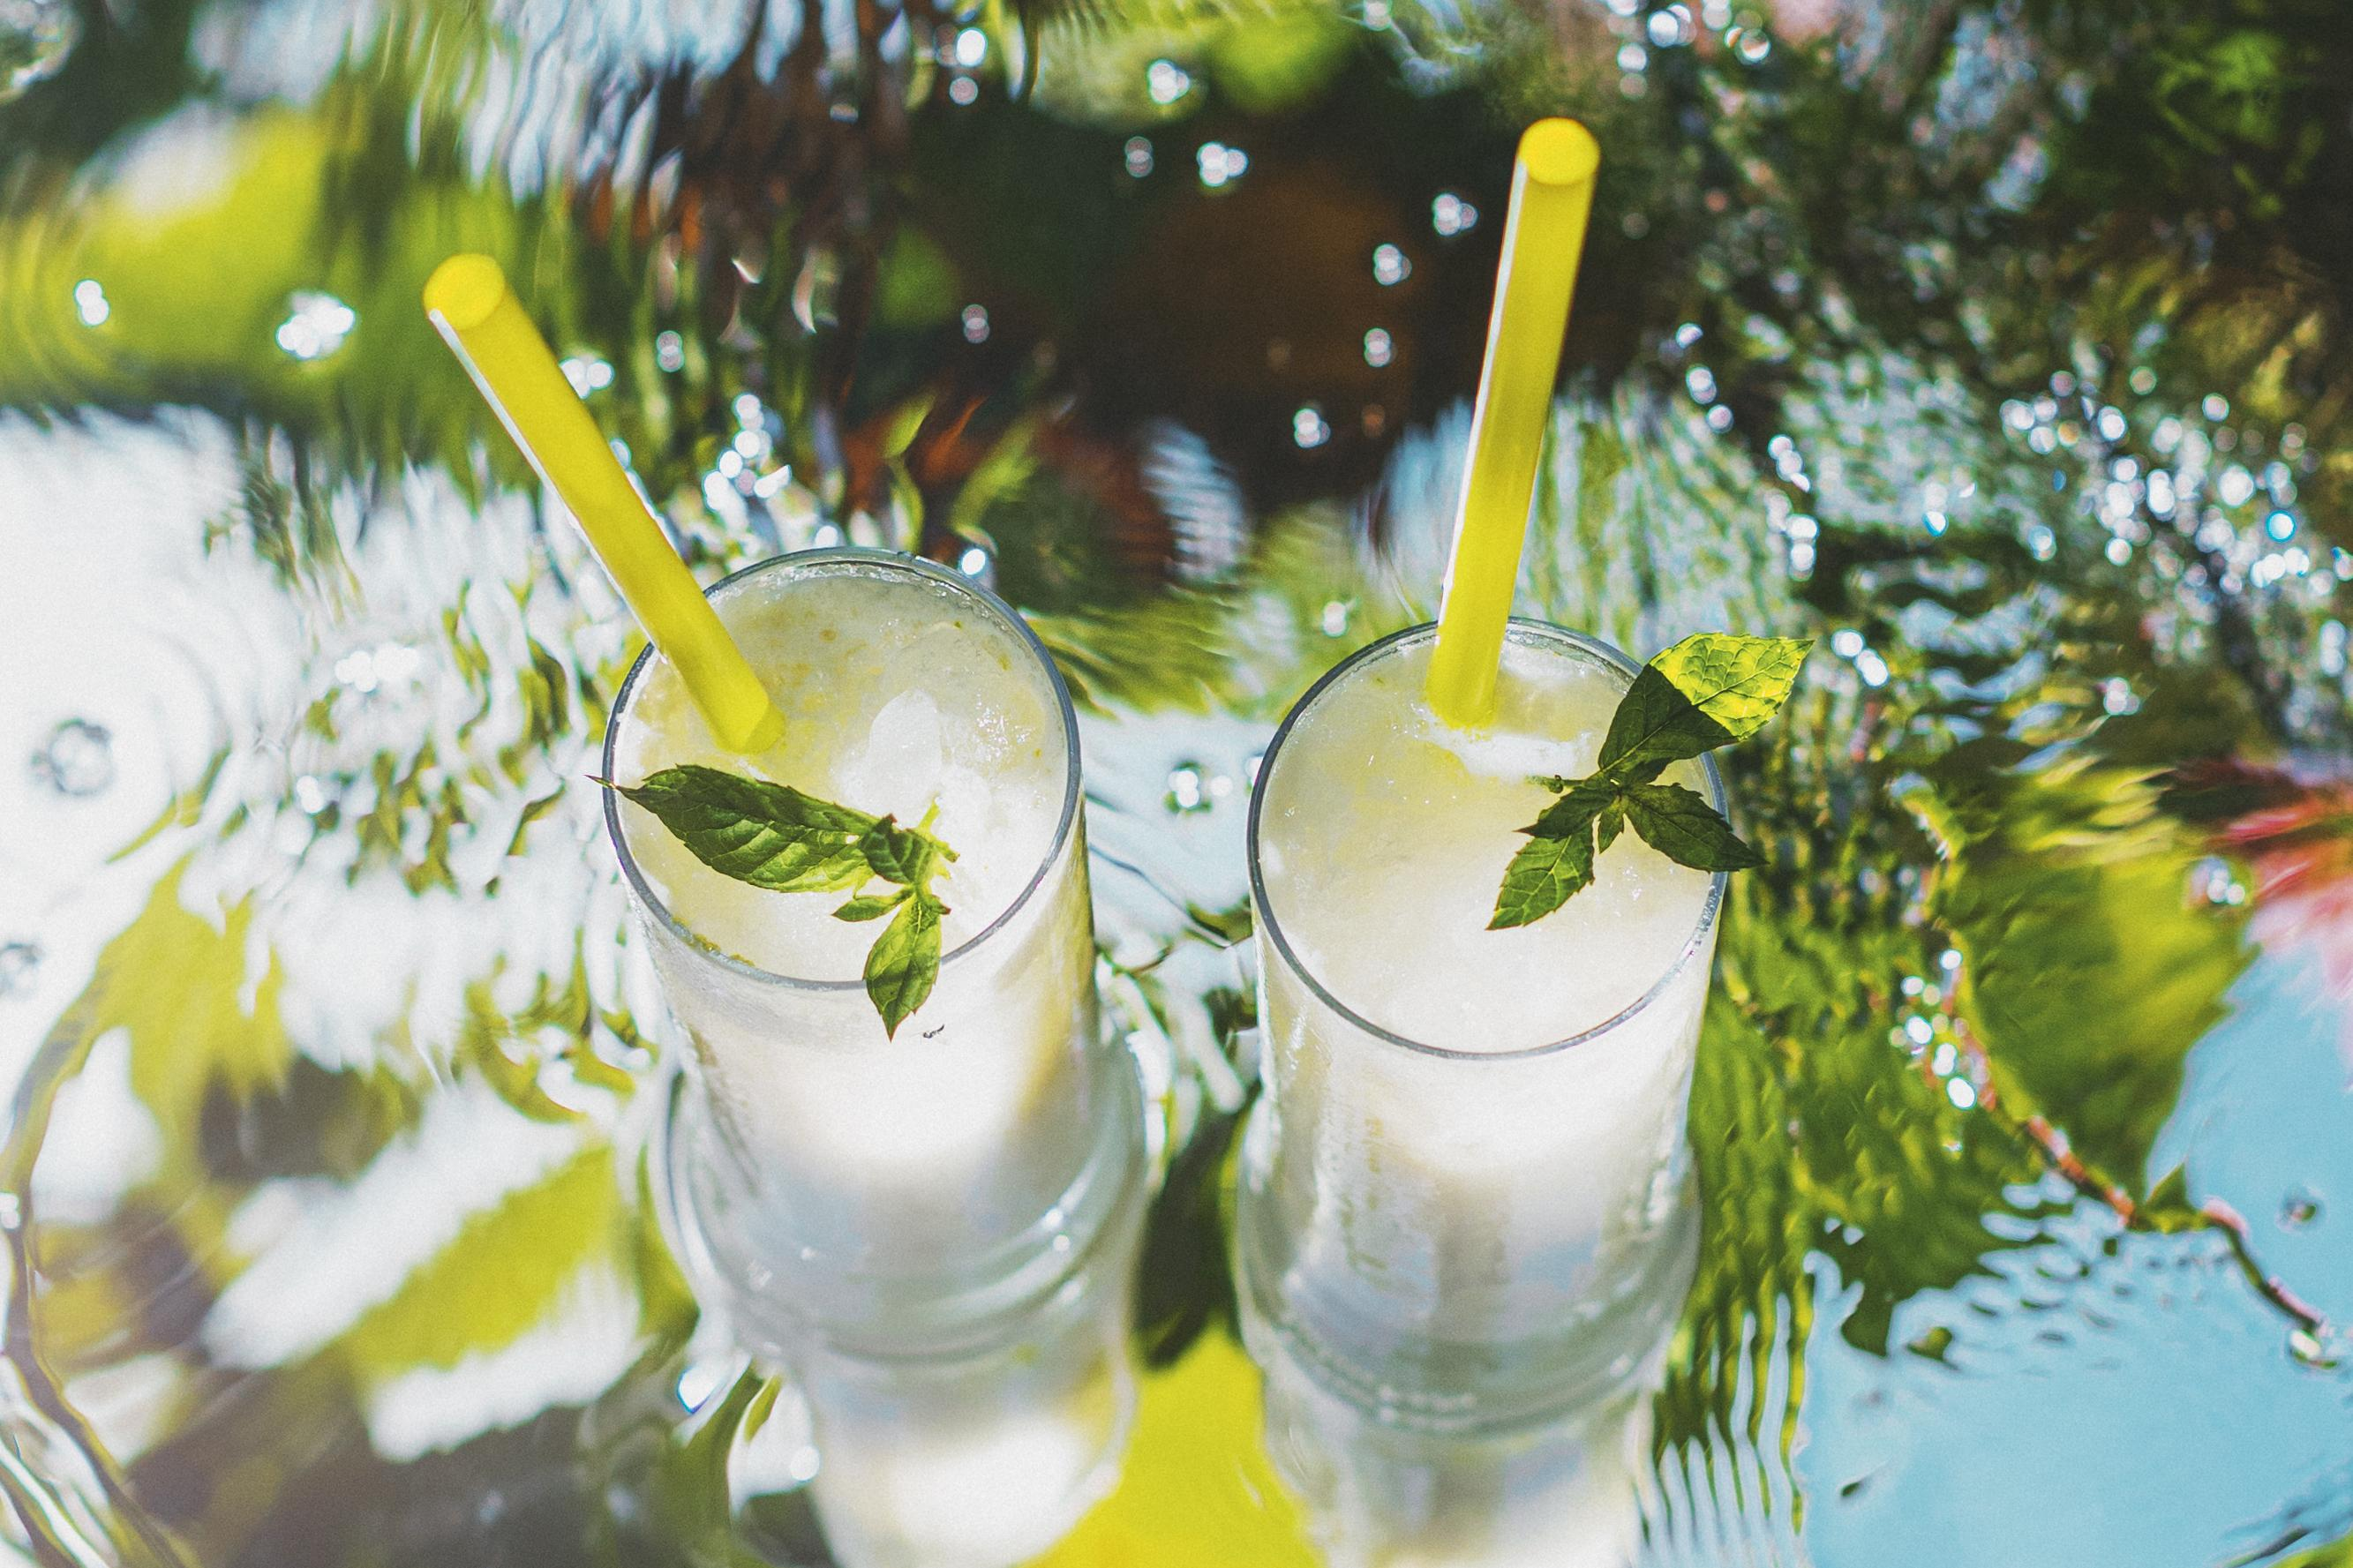 DOODH SODA (bebida a base de leche y gaseosa)